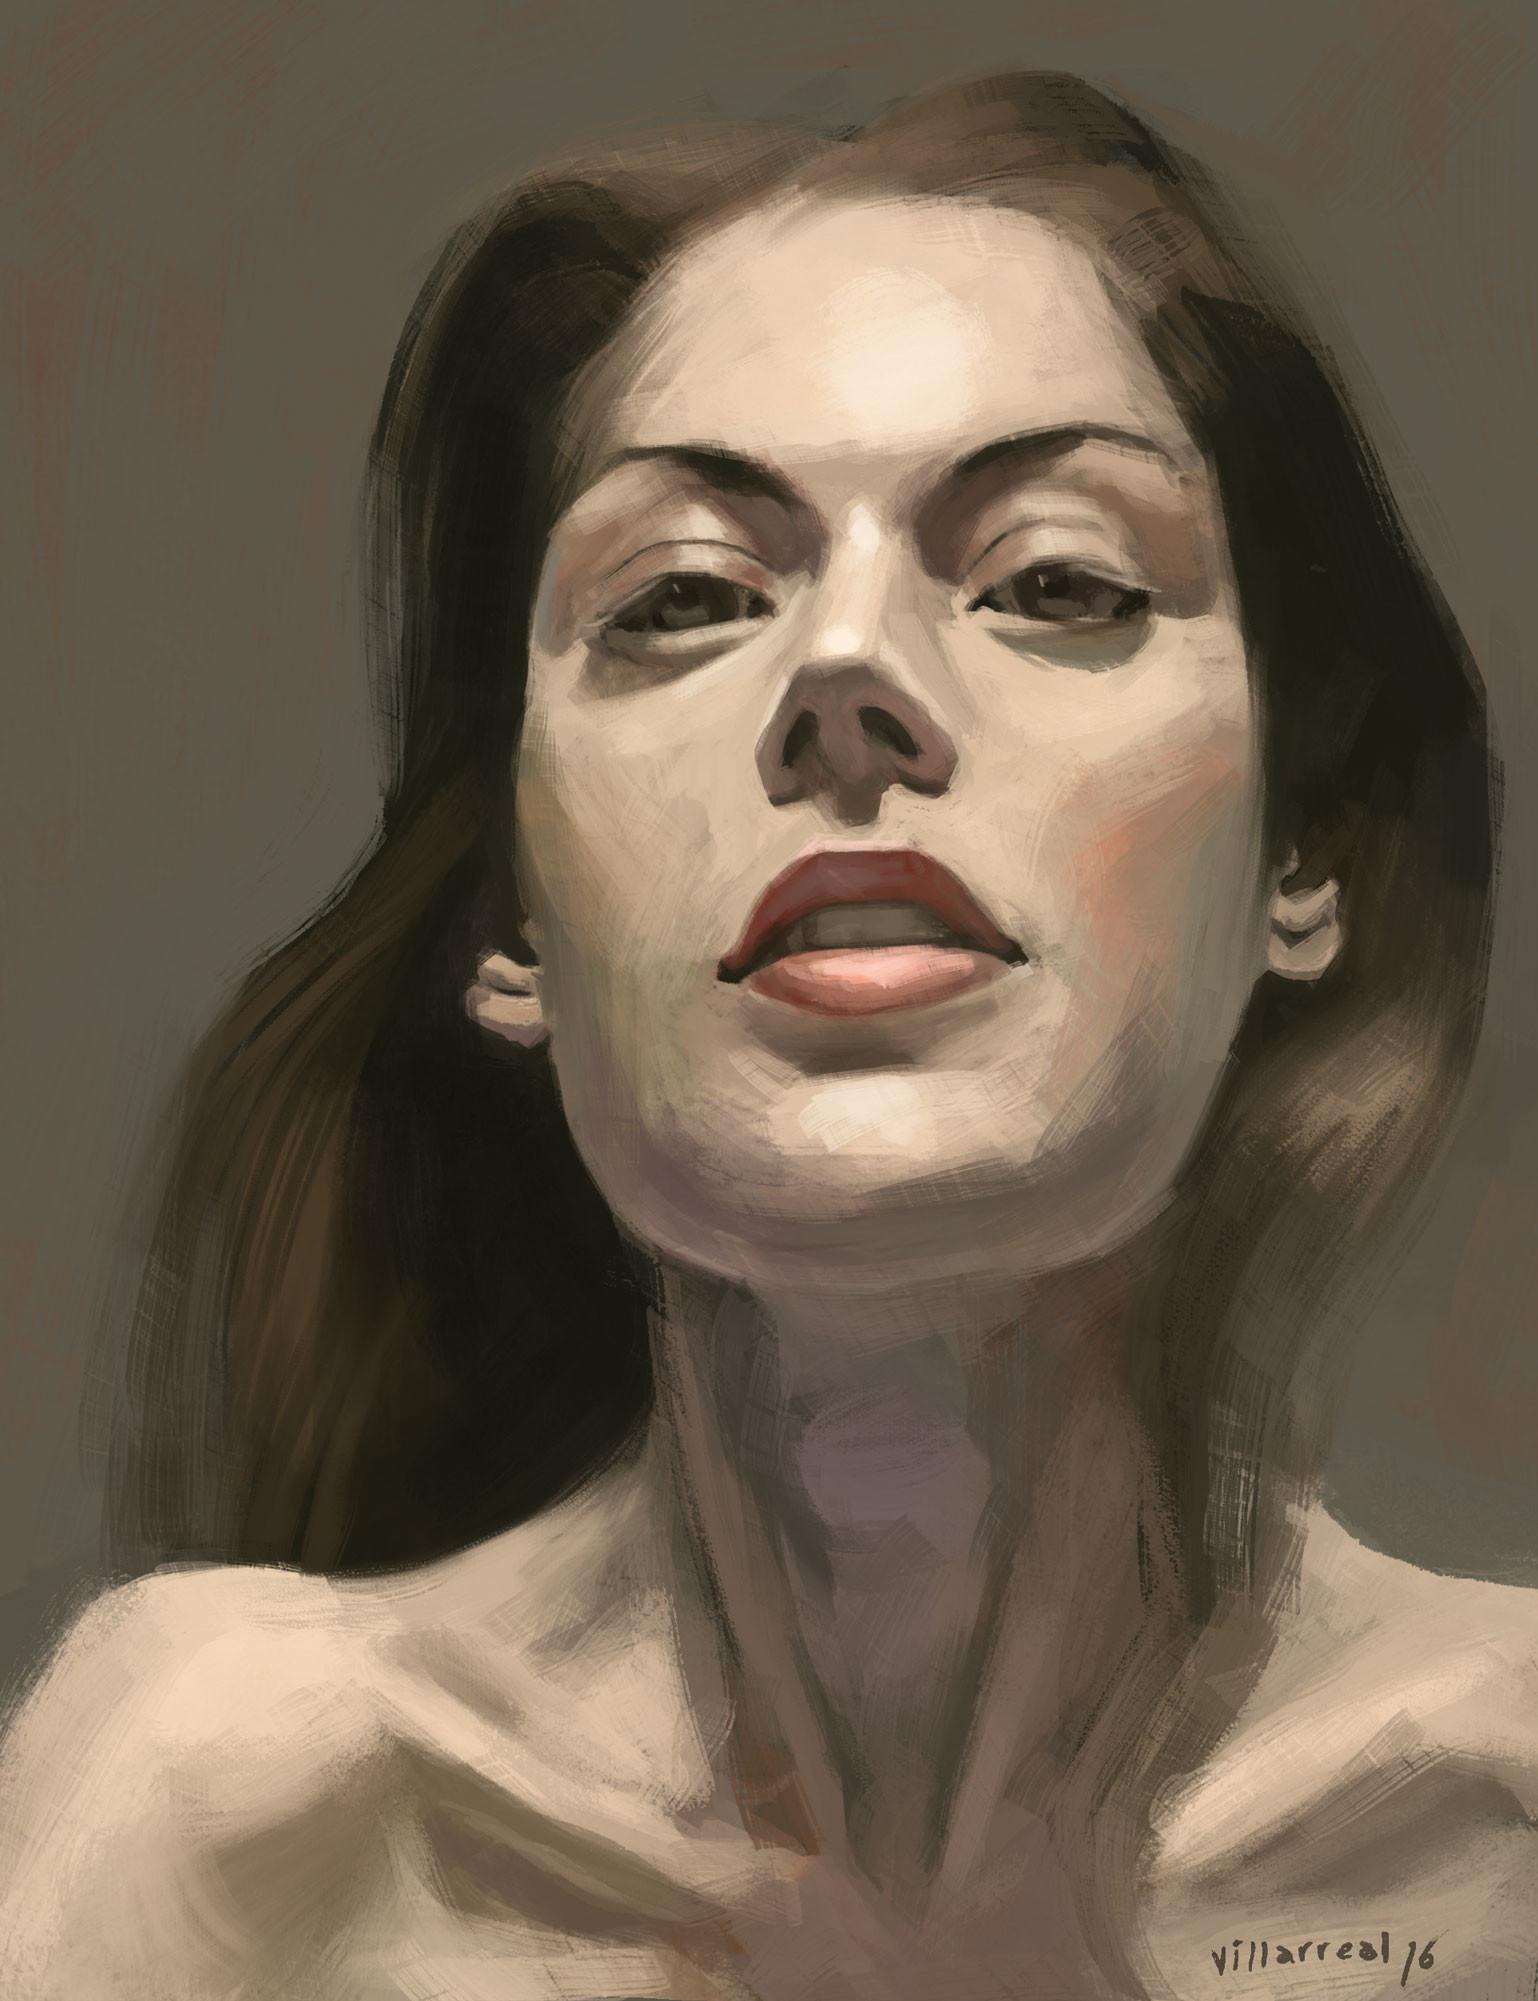 Carlos villarreal kwasek carlos villarreal kwasek portrait study 02